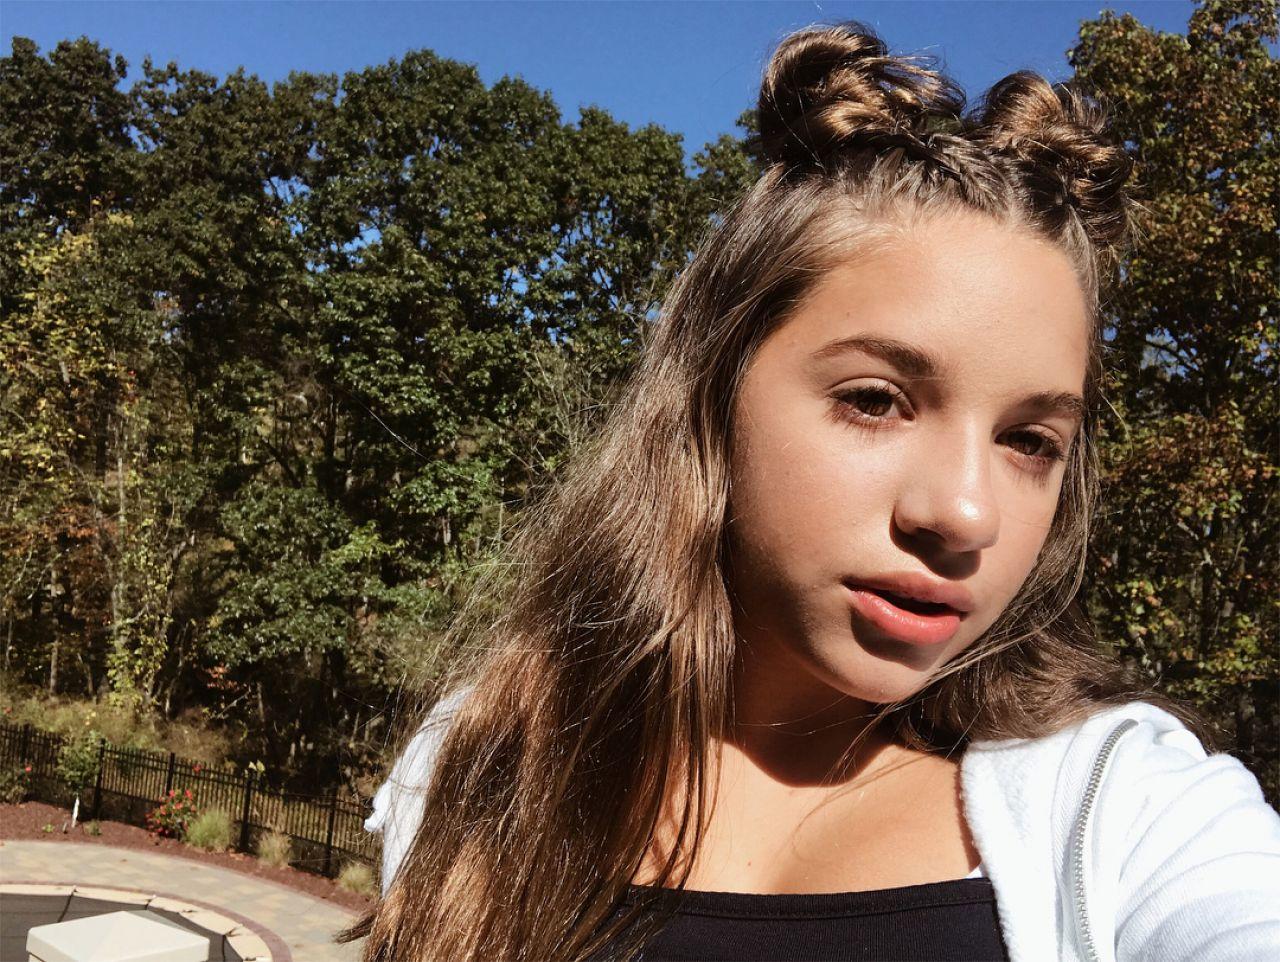 Mackenzie Ziegler Pics Social Media 10 16 2017